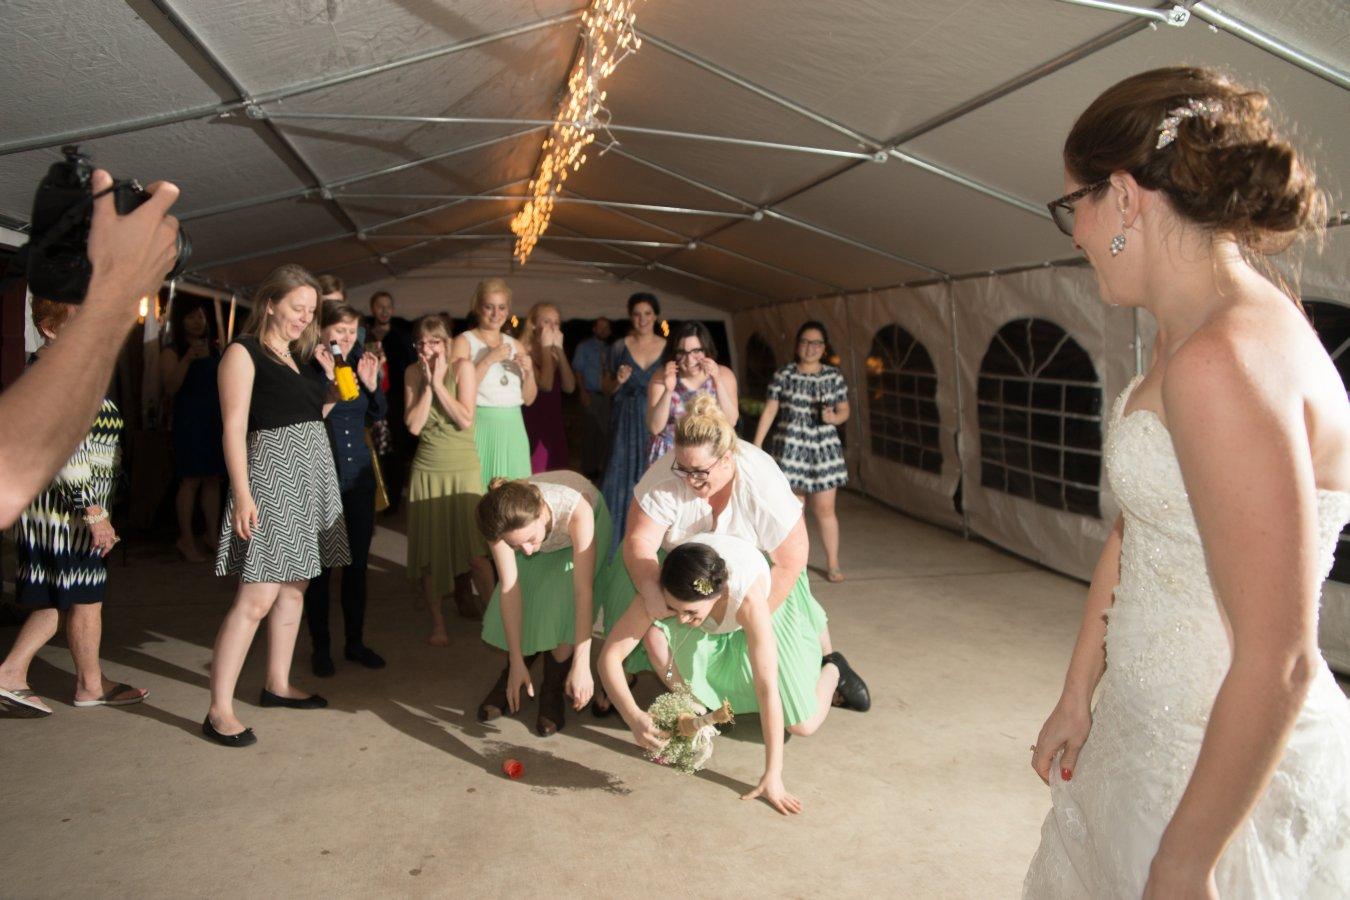 HighDot-Studios-Wedding-Cedar-Bend-Event-Center -Austin-Kim and Mike (78)